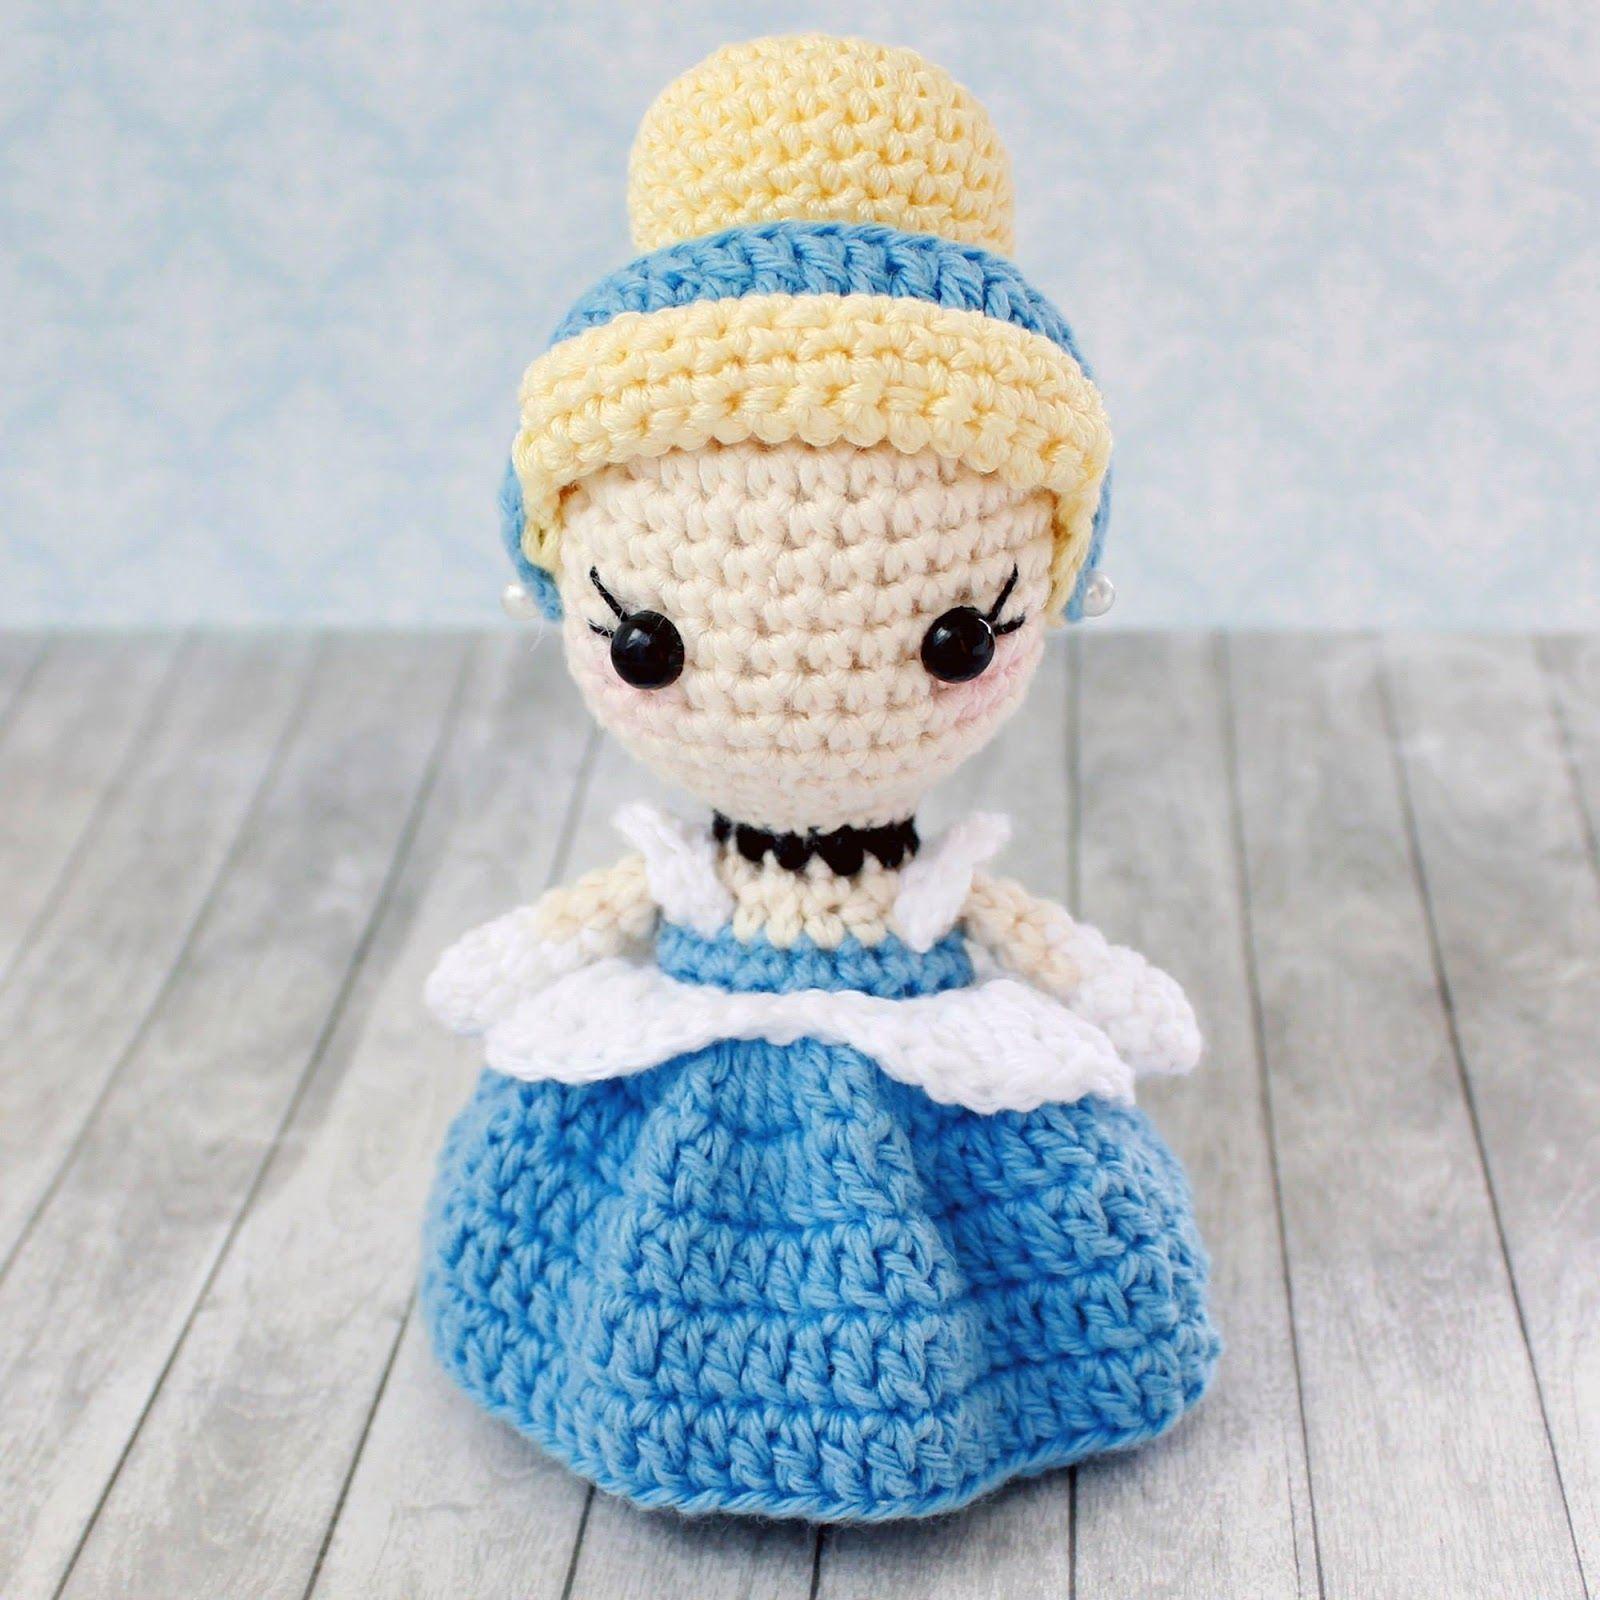 Pin by Tuba Güngördi on amigurumi | Pinterest | Crochet, Crochet ...